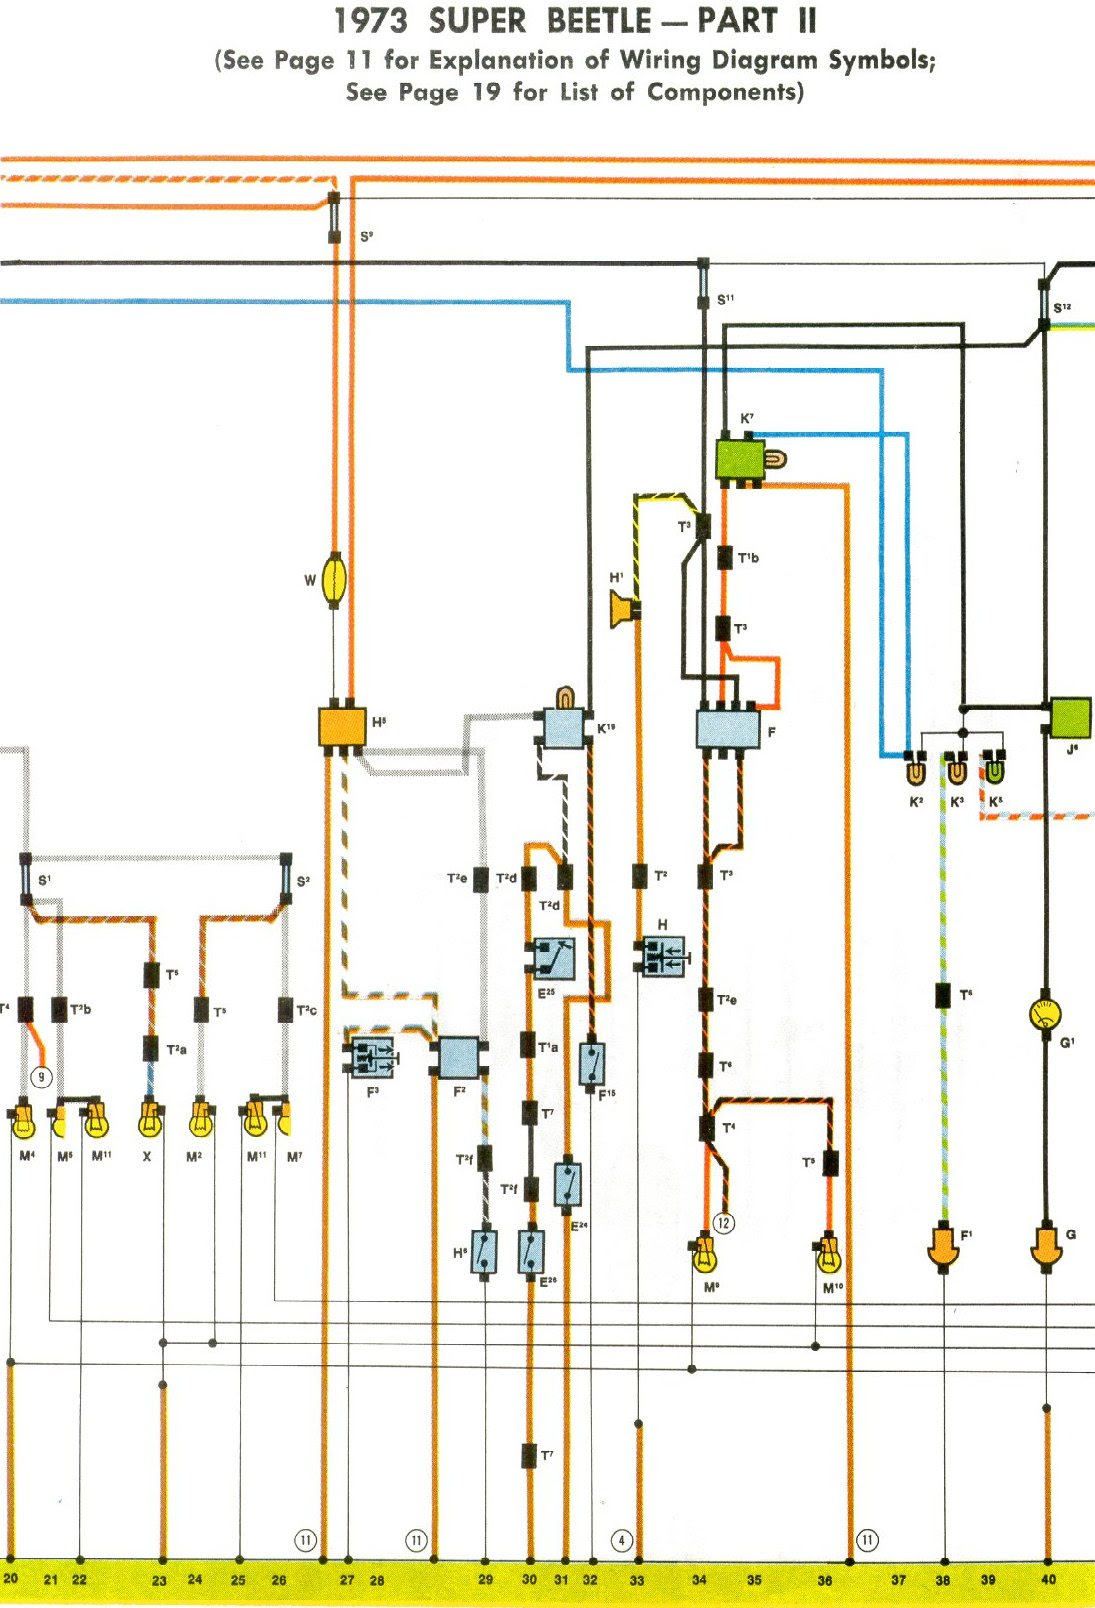 Diagram Vw Super Beetle Wiring Diagram Full Version Hd Quality Wiring Diagram Uwiringx18 Locandadossello It